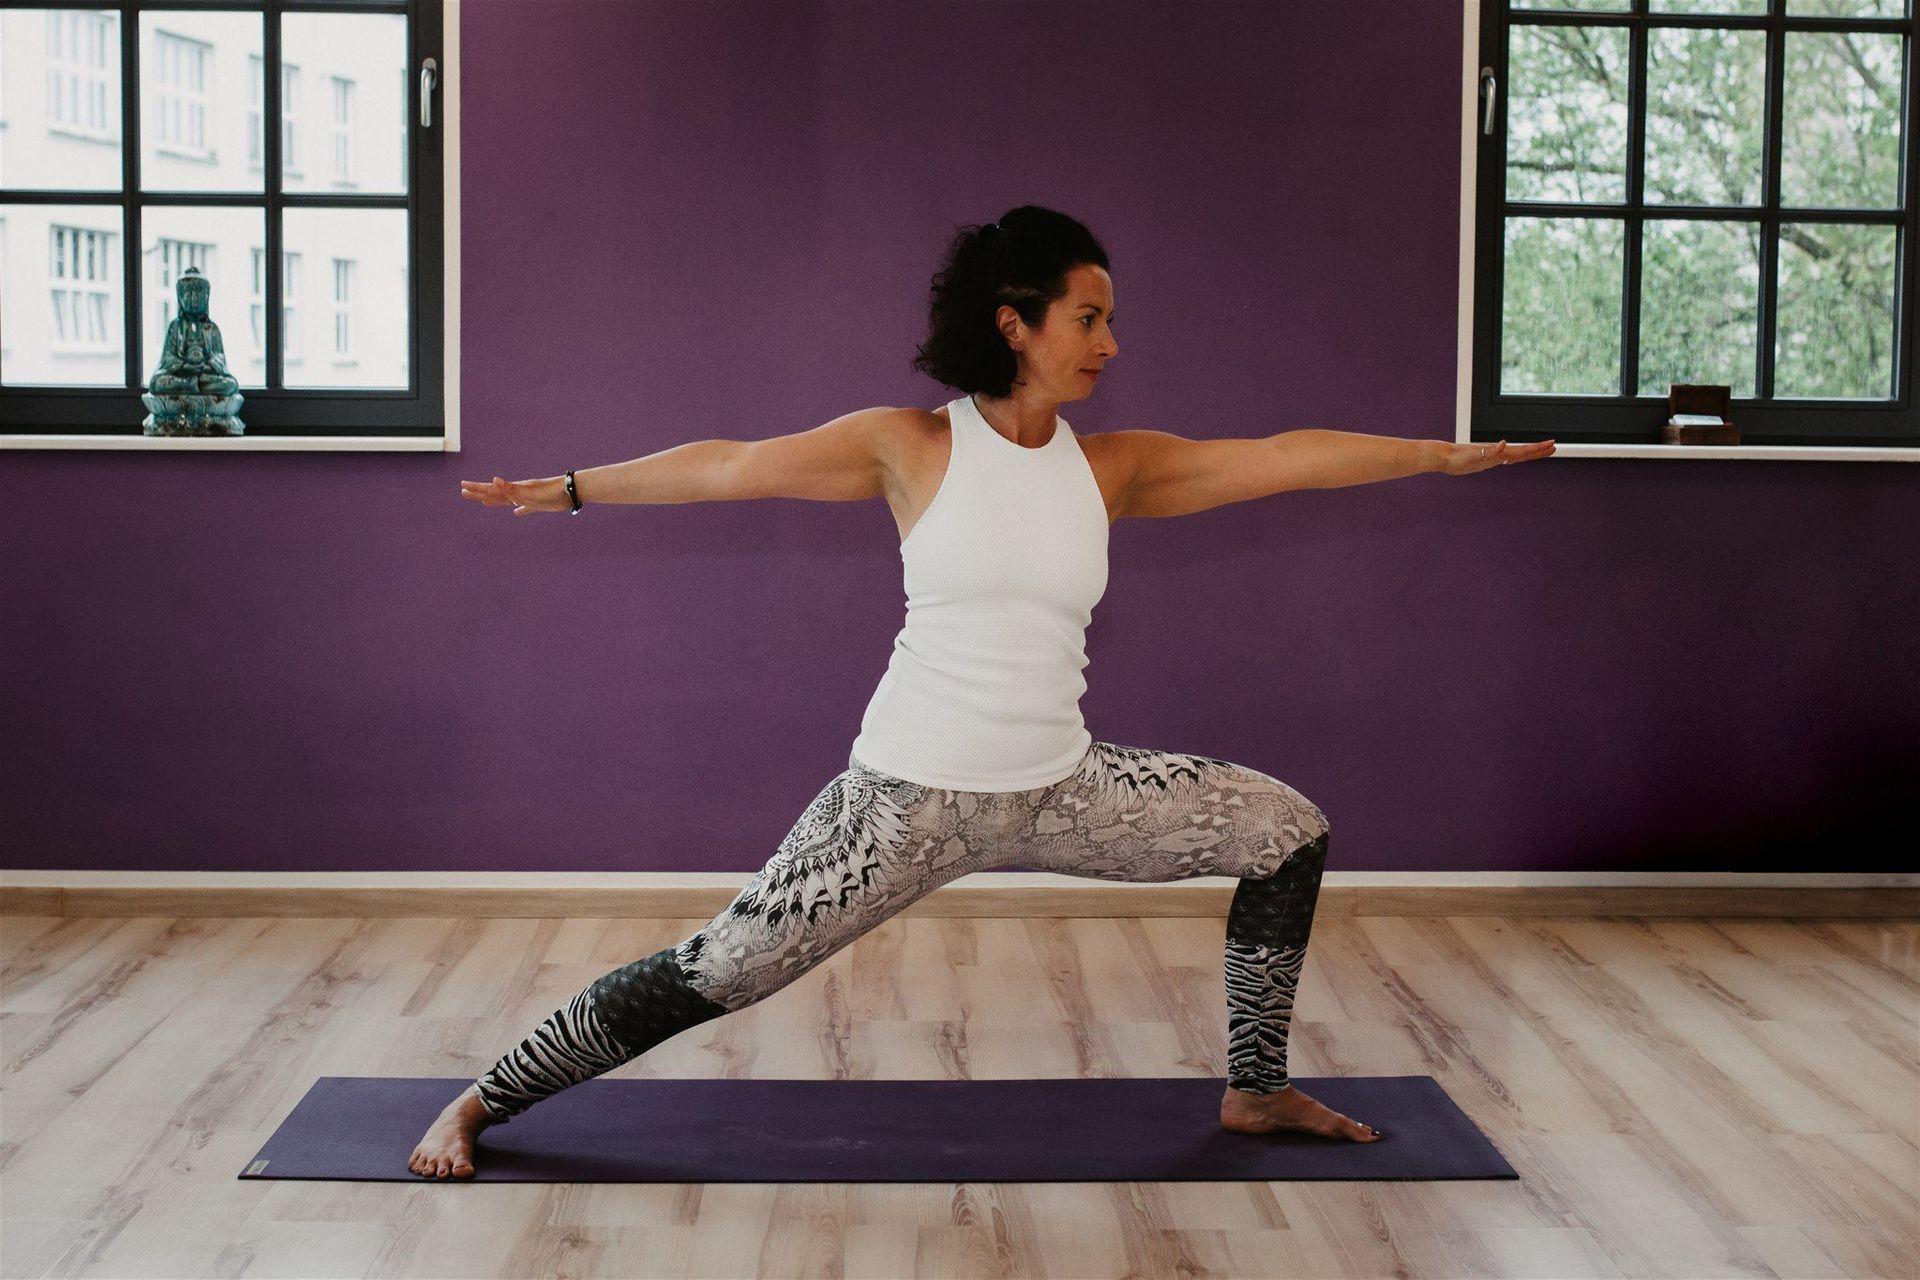 Warum Yoga? - Warum YOGA? | Yoga Raum Wipp